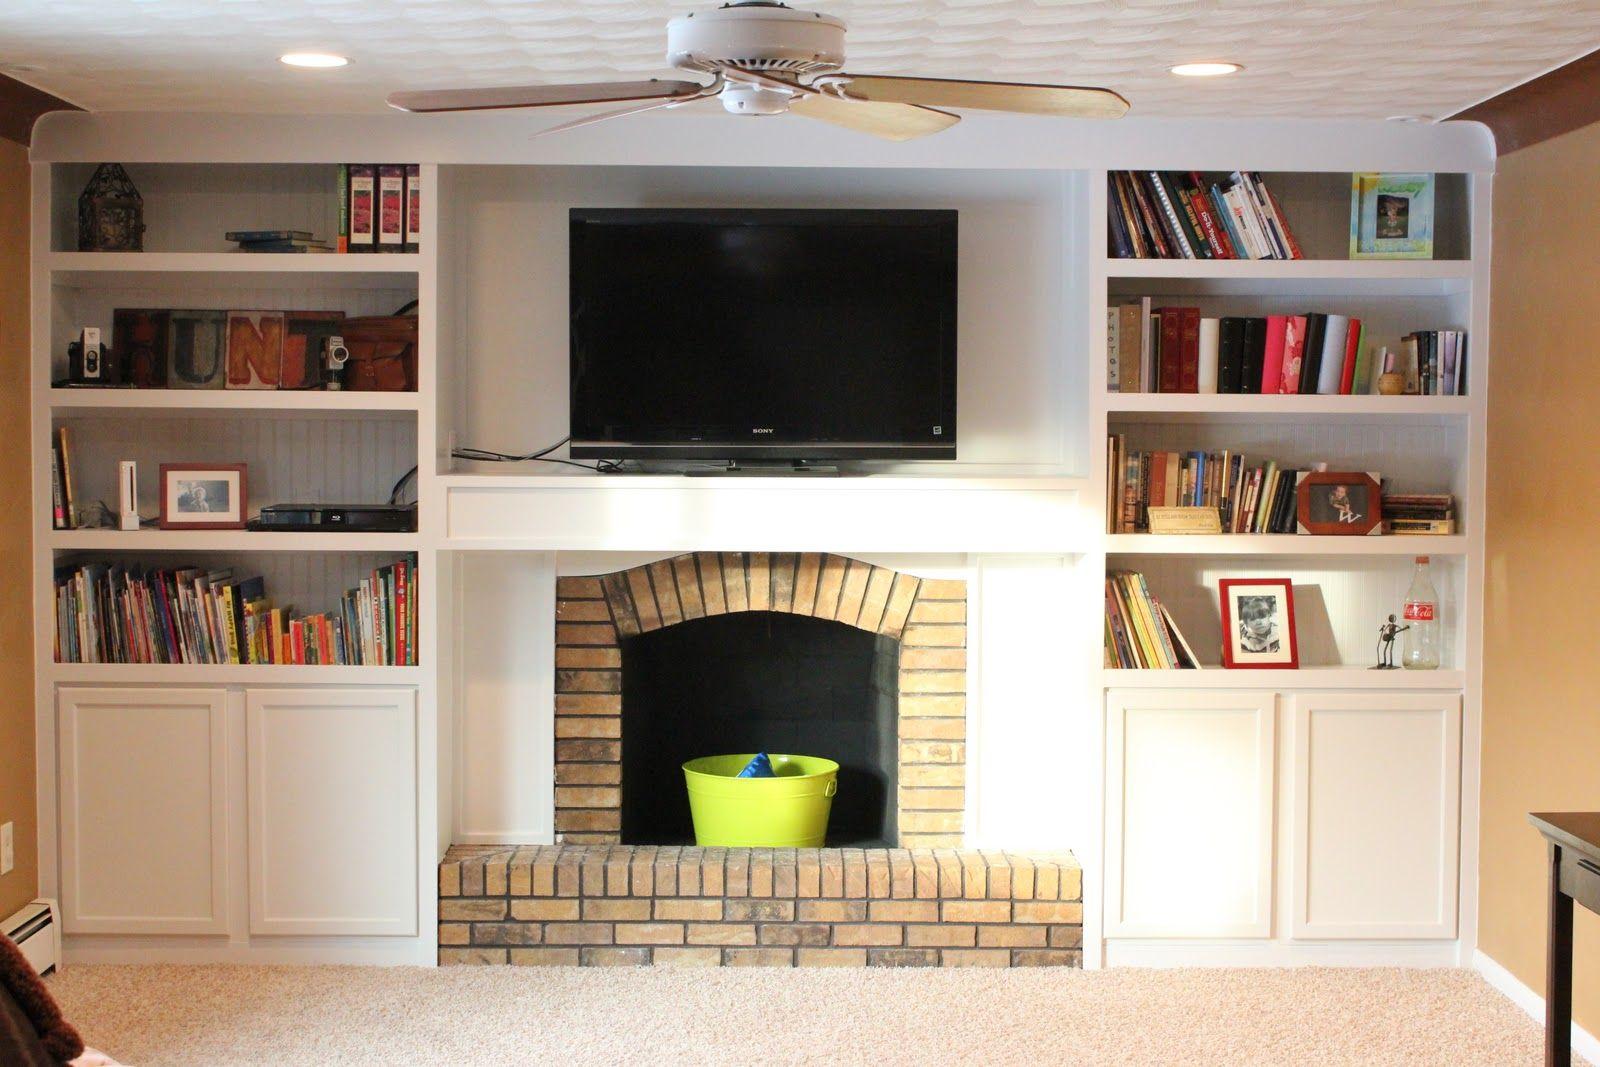 Ikea Hack Hemnes Bookshelf Built Ins Fireplace Google Search Built In Around Fireplace Fireplace Remodel Bookshelves Around Fireplace